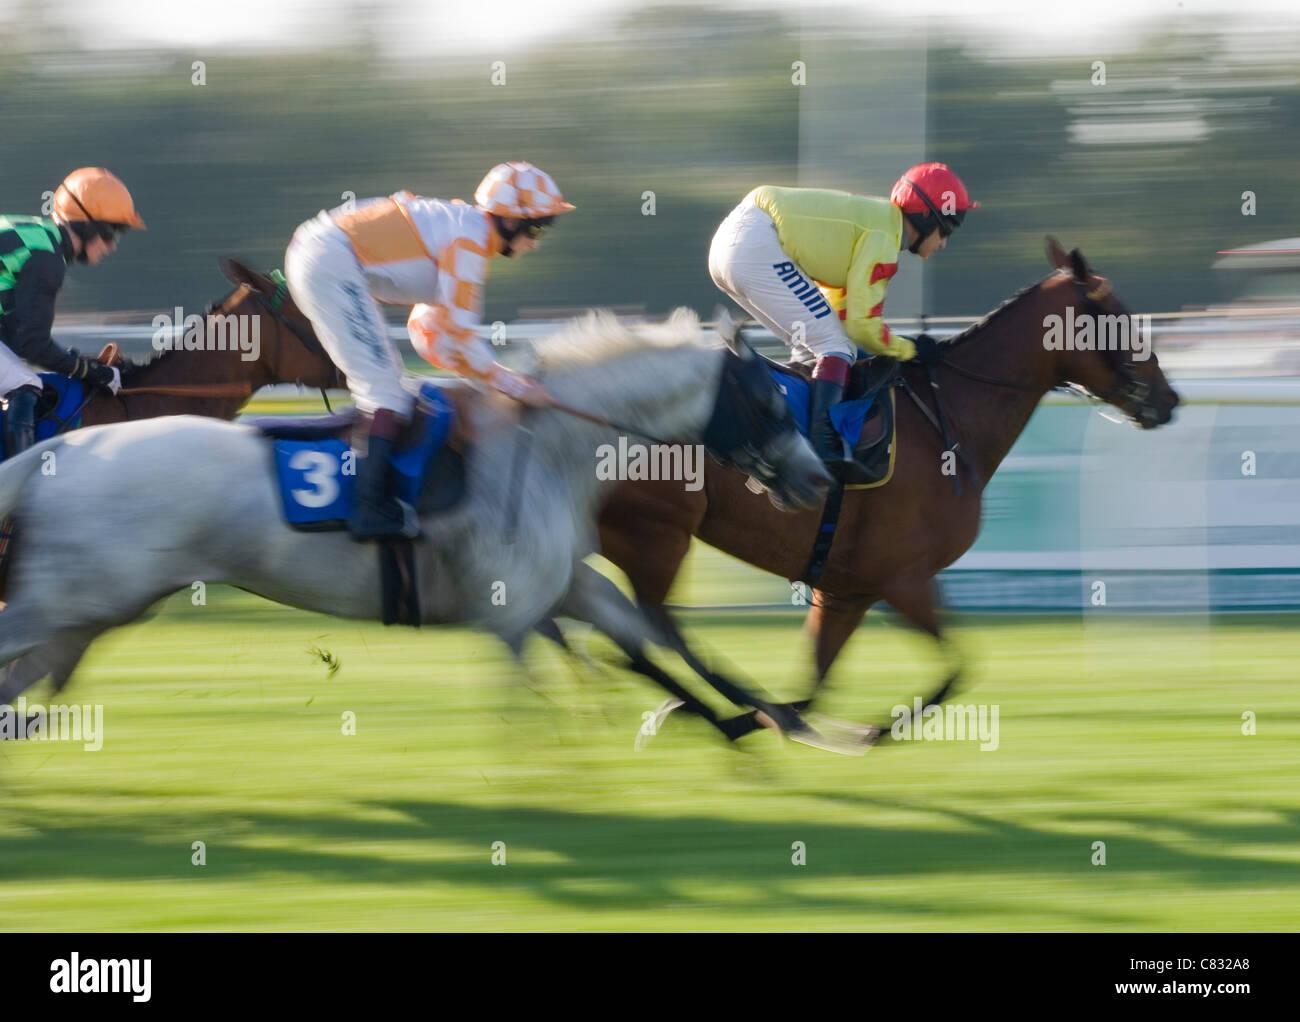 Horse racing Group of horses racing UK - Stock Image